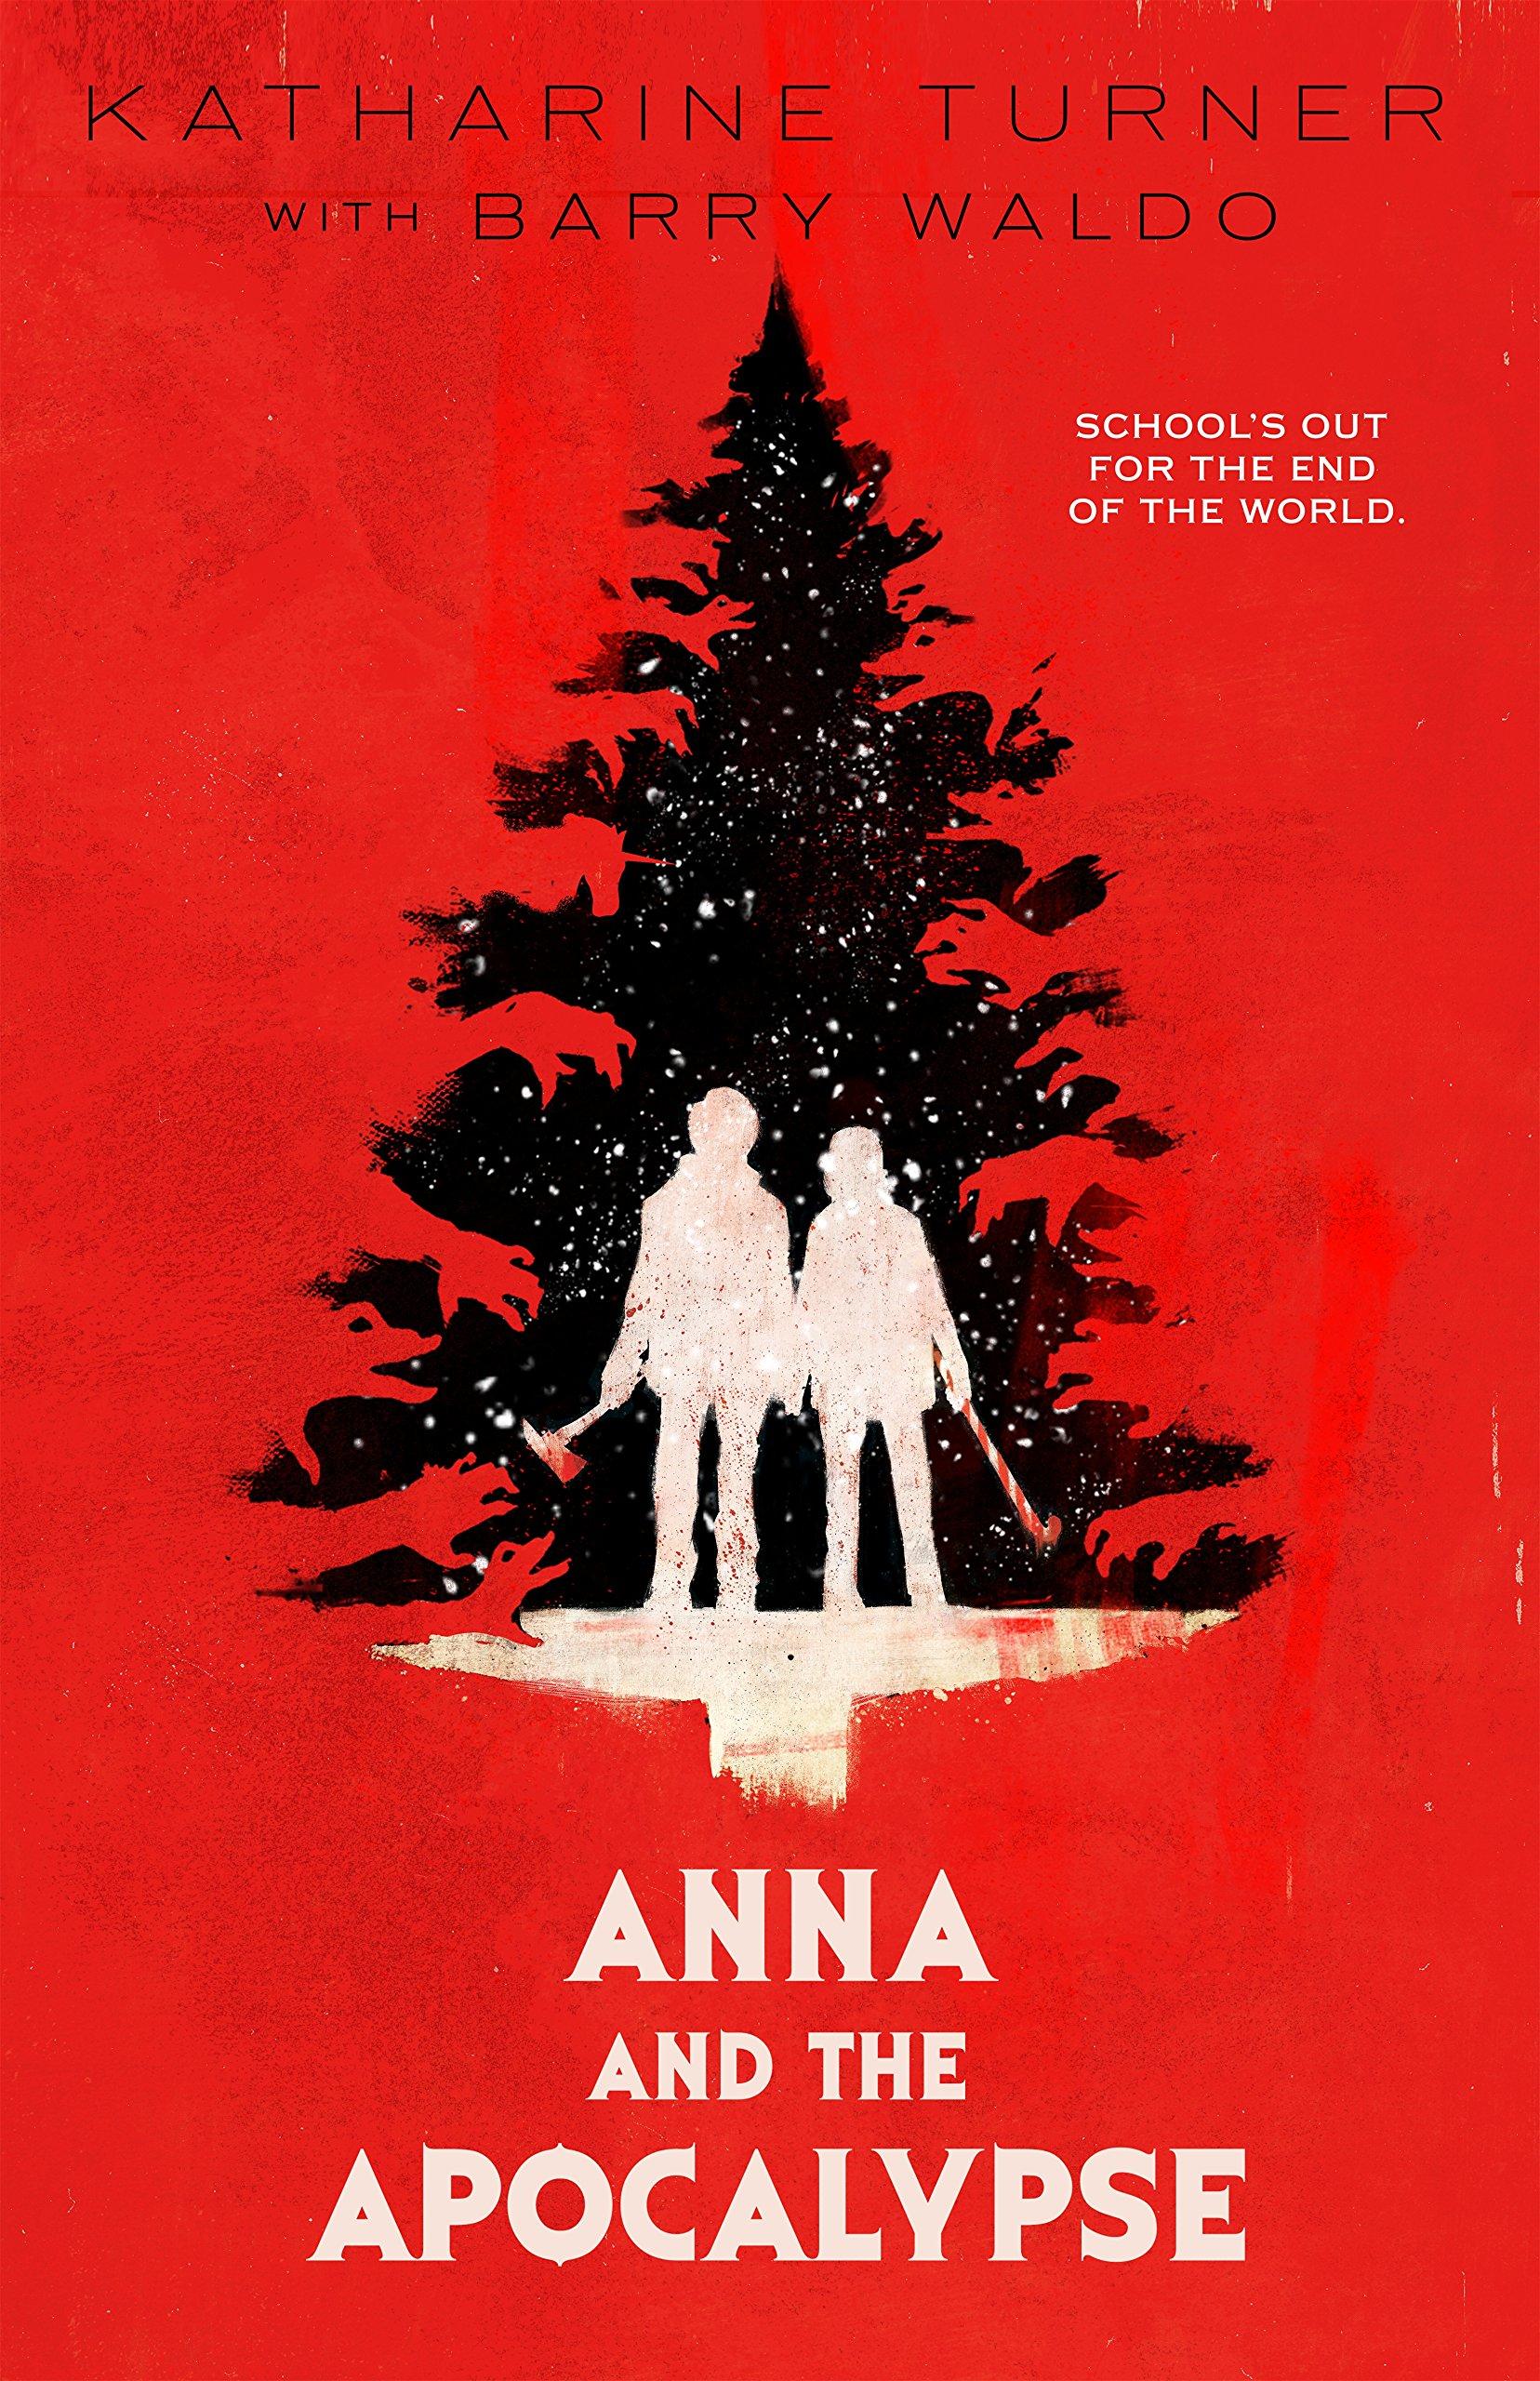 ANNA & THE APOCALYPSE MOVIE TIEIN: KATHARINE TURNER: Amazon